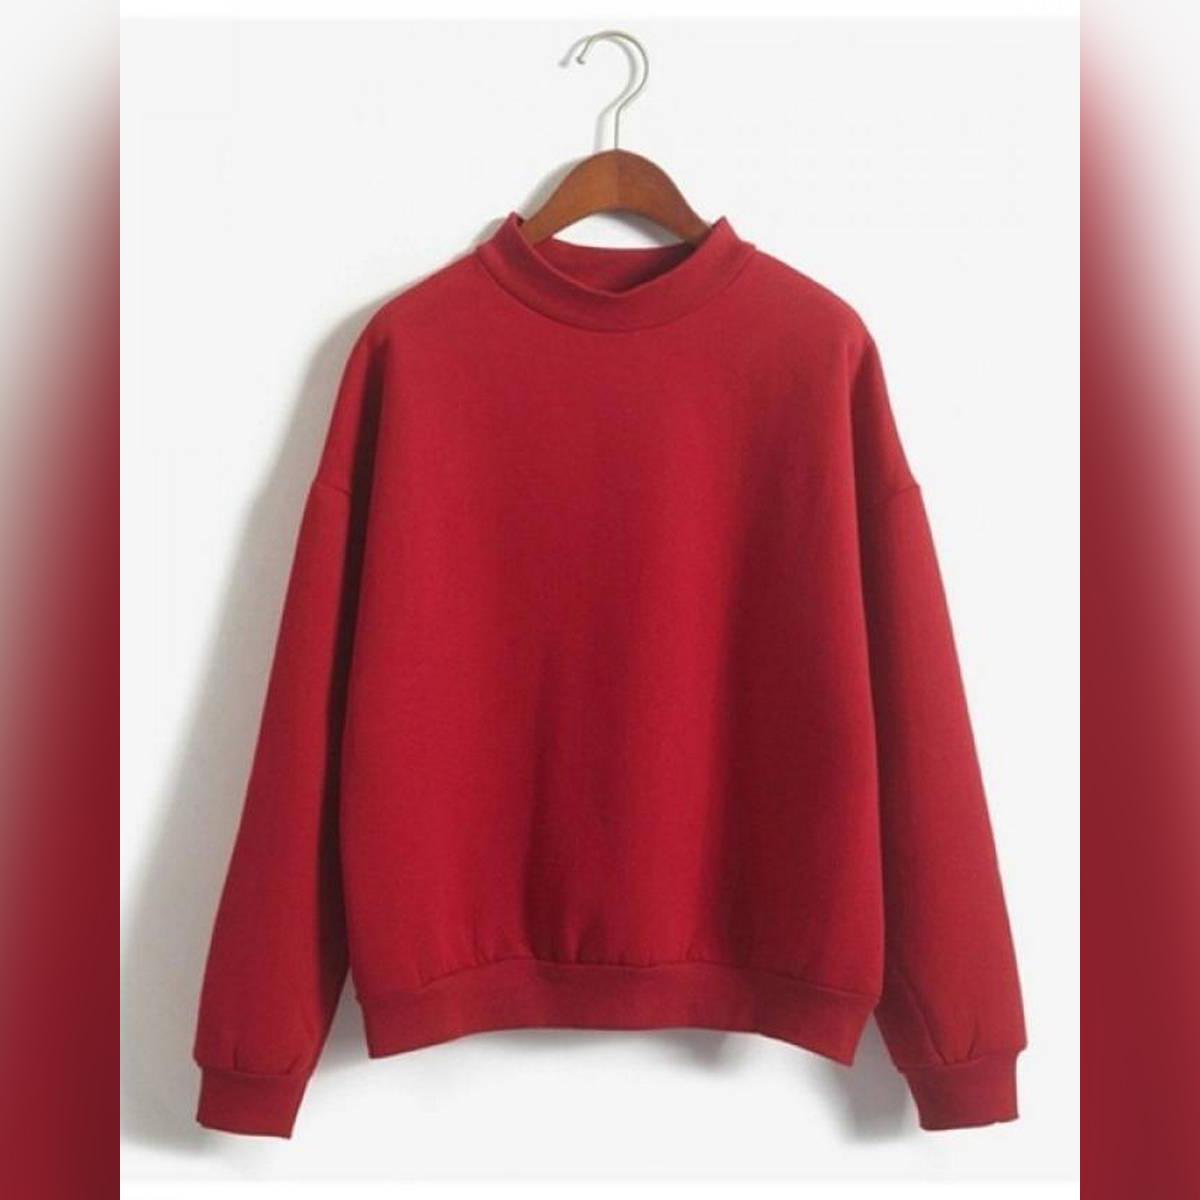 Sweatshirt 2018 Winter Casual Loose Fleece Pullover Red